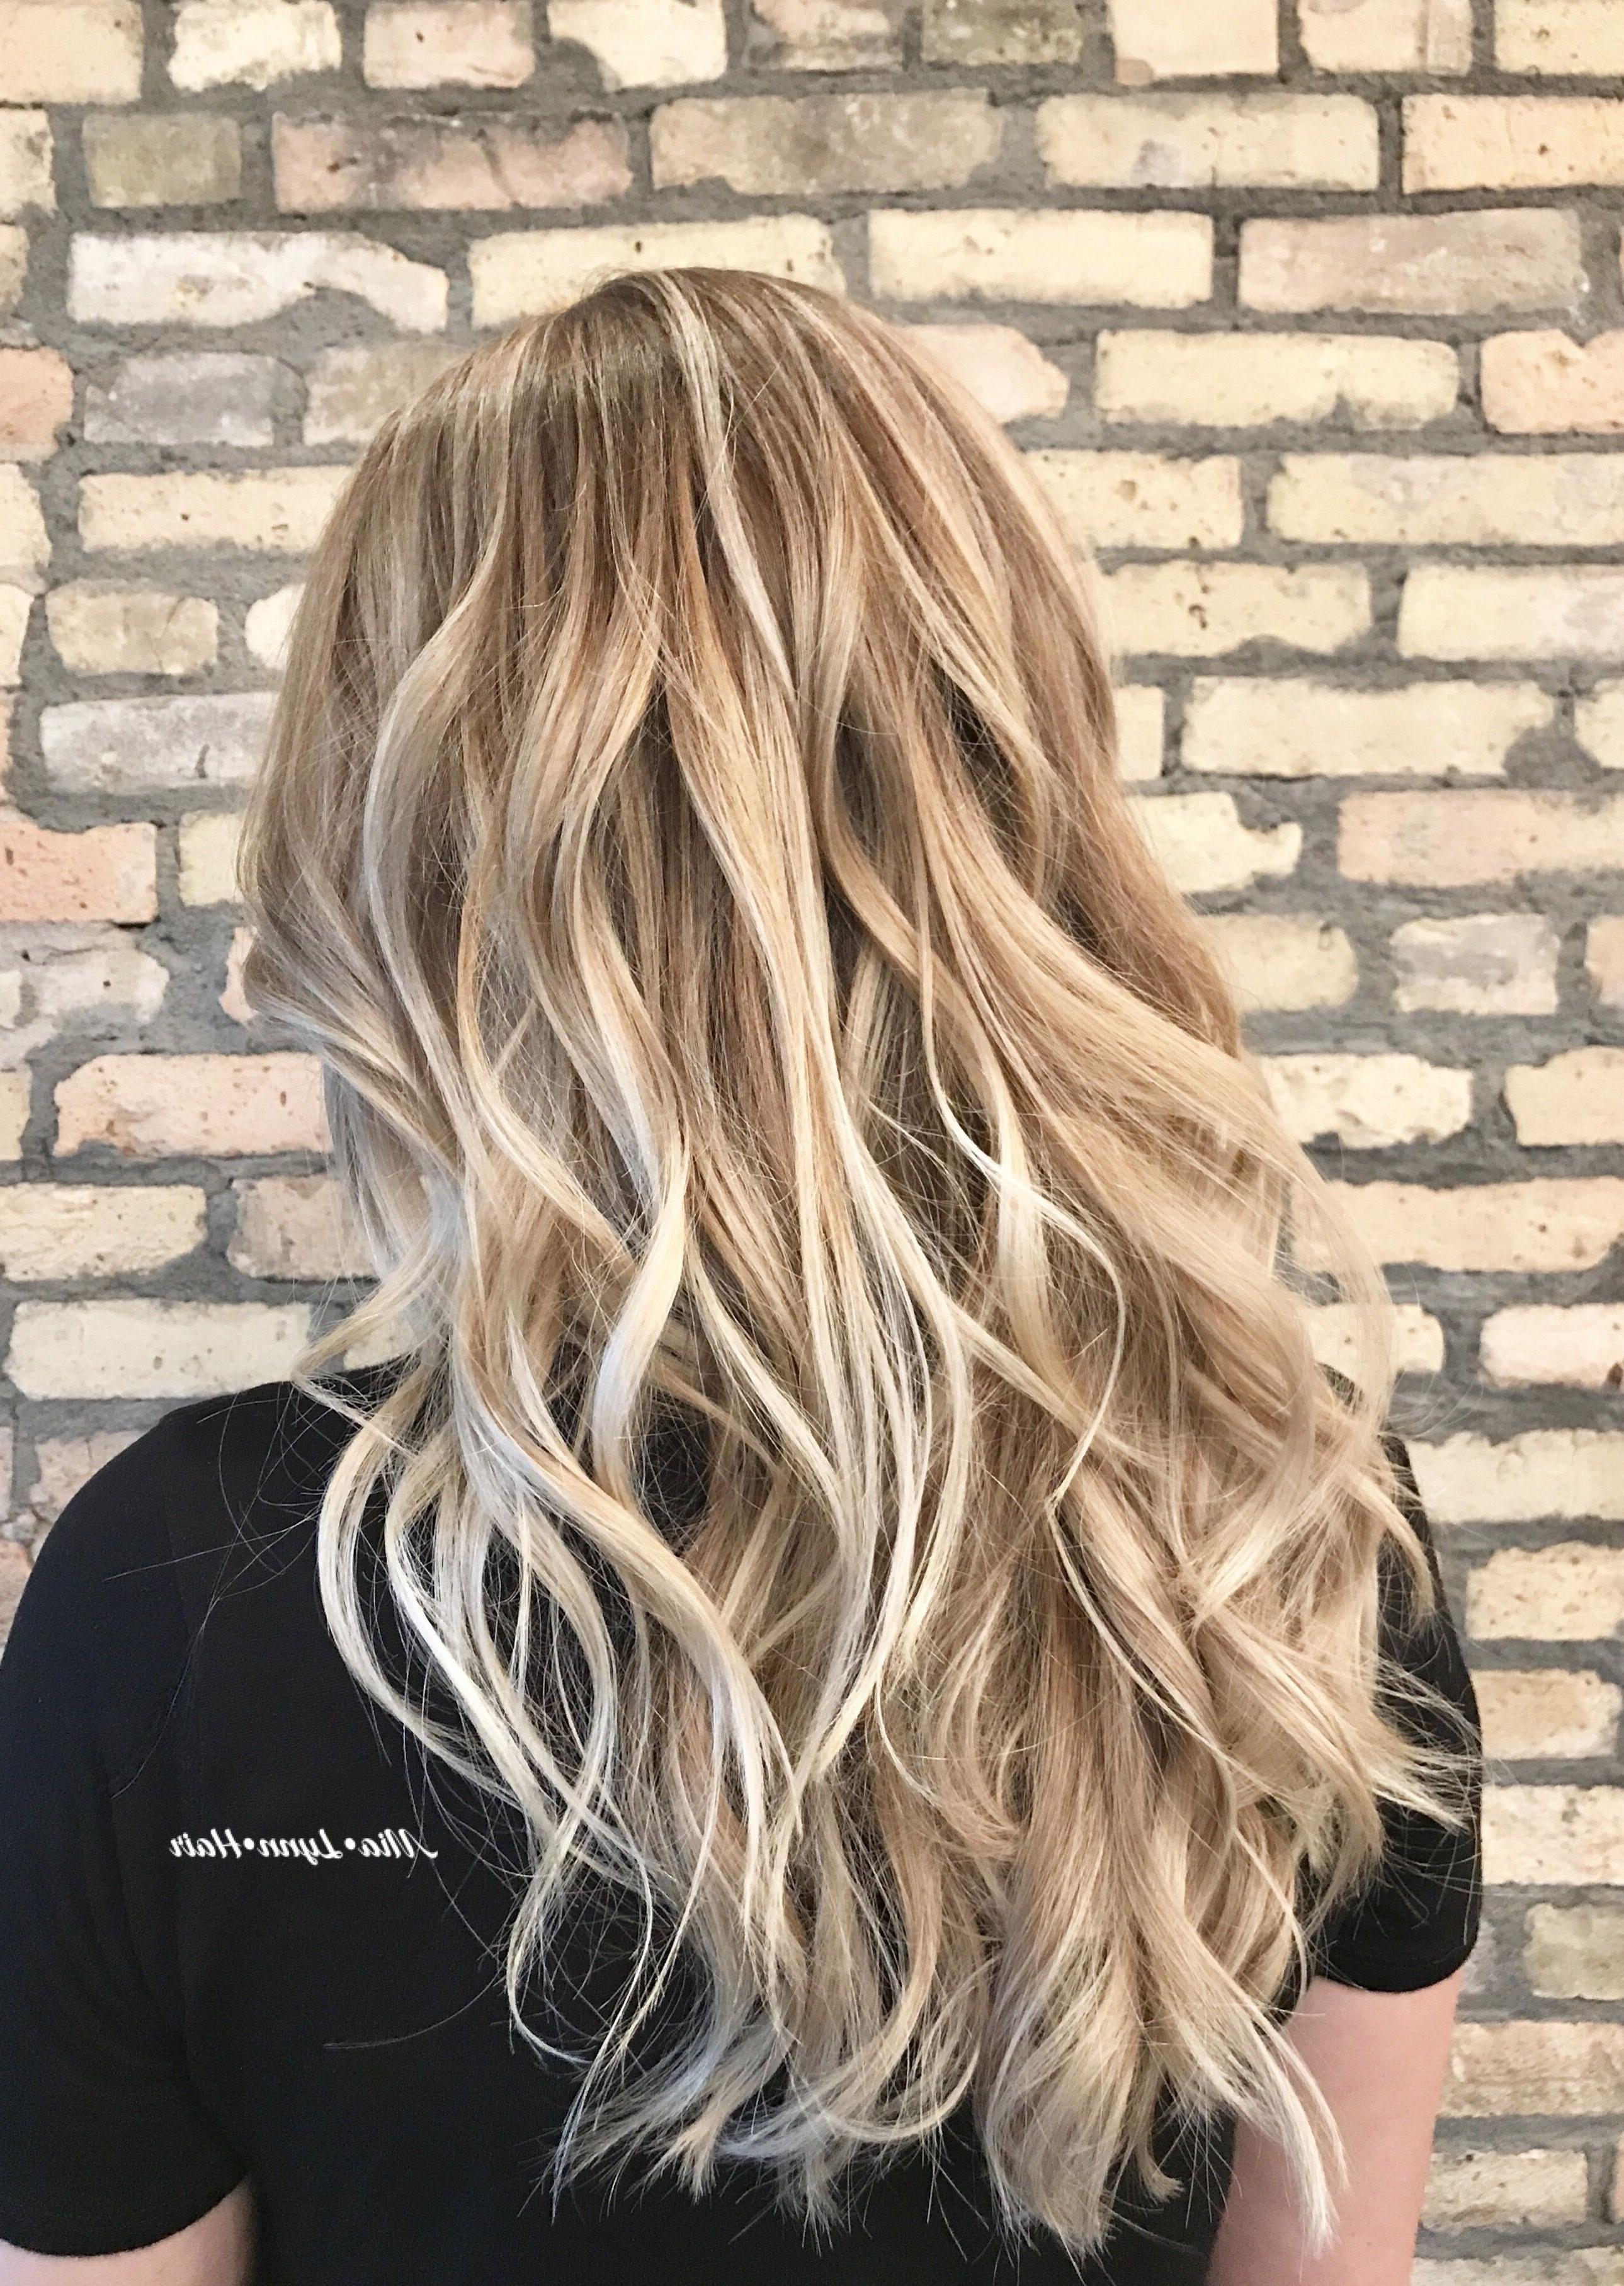 Blonde, Dimensional Blonde, Balayage, Blonde Balayage, Face Framing With Regard To Most Recent Dishwater Waves Blonde Hairstyles (View 11 of 20)